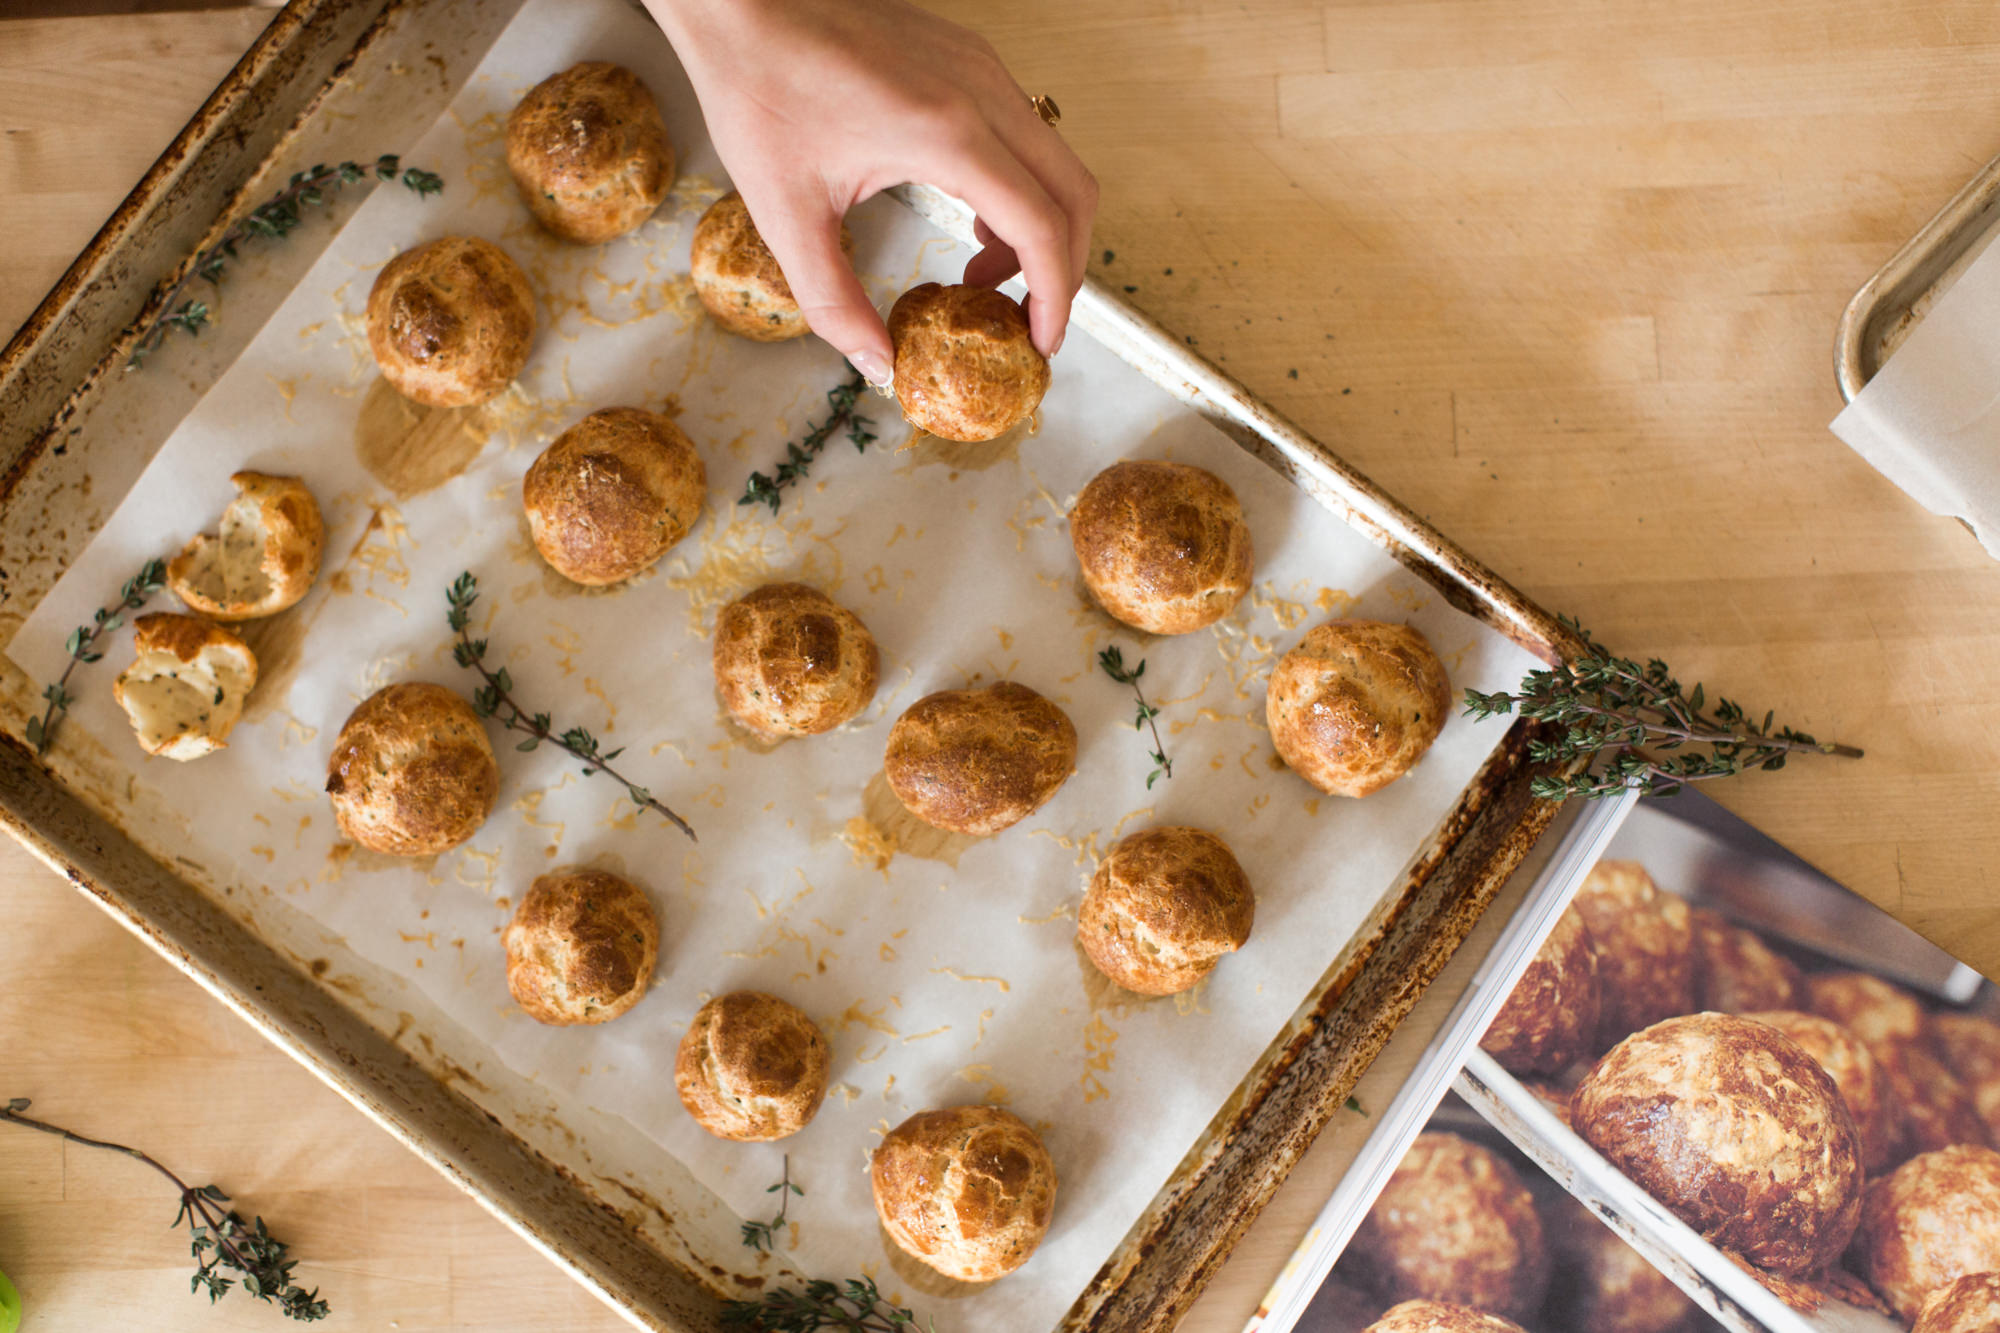 baked gougères